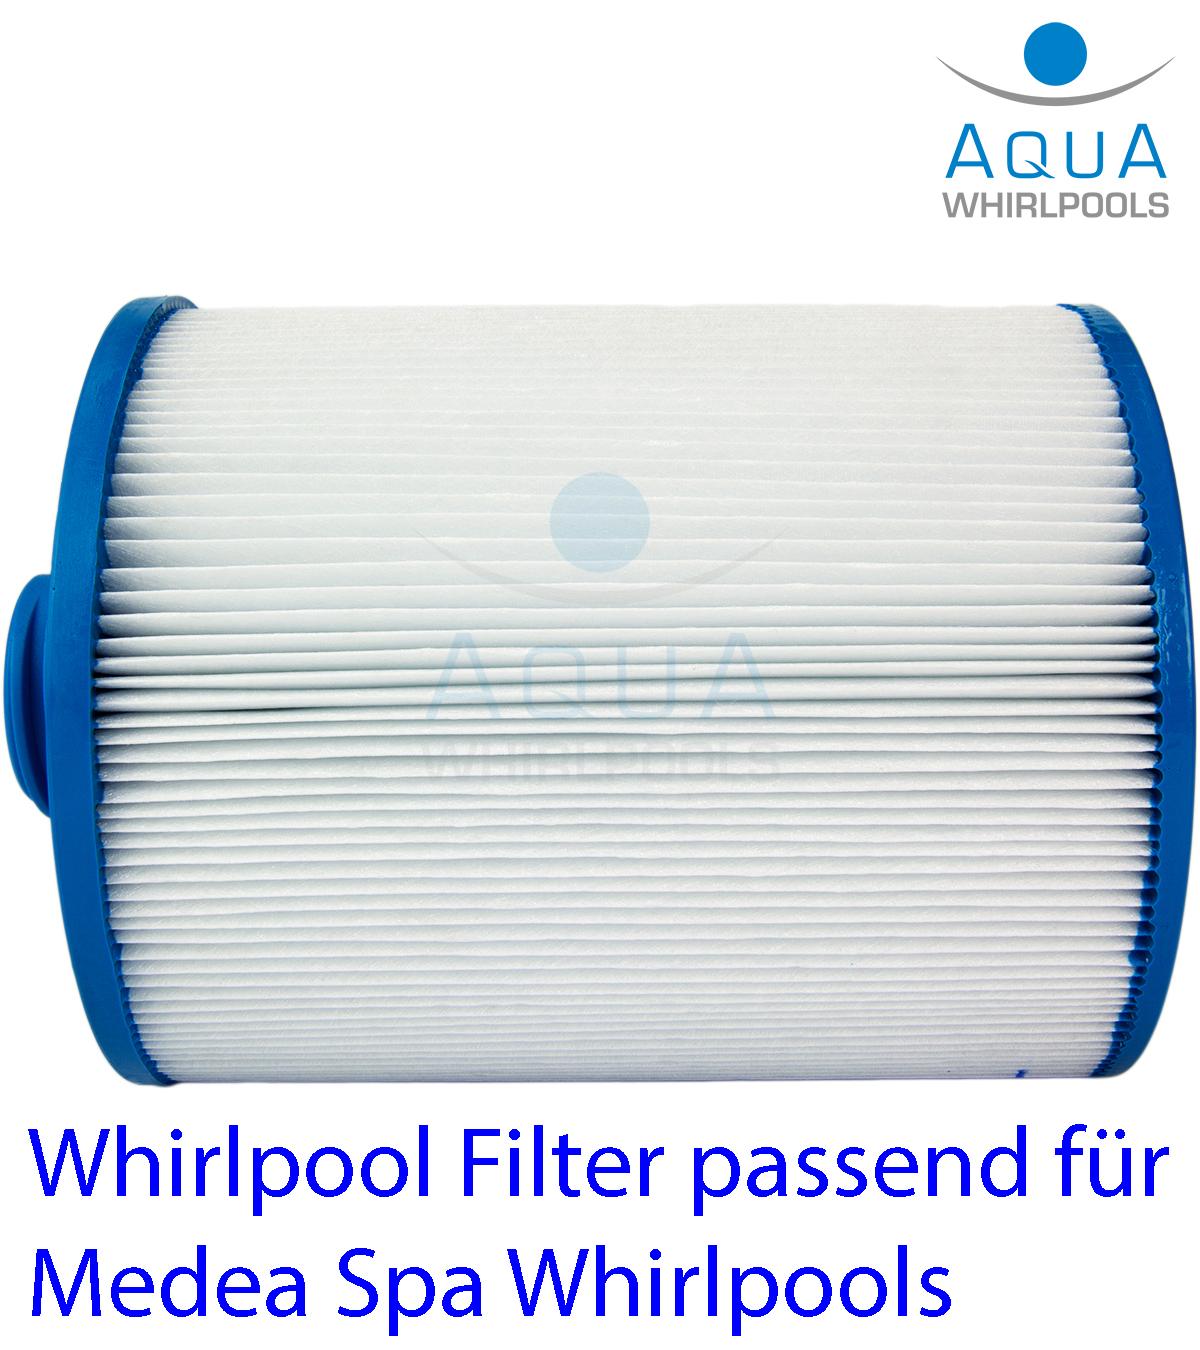 Whirlpool filter passend f r medea spa whirlpools blog aqua whirlpools - Aqua whirlpools ...